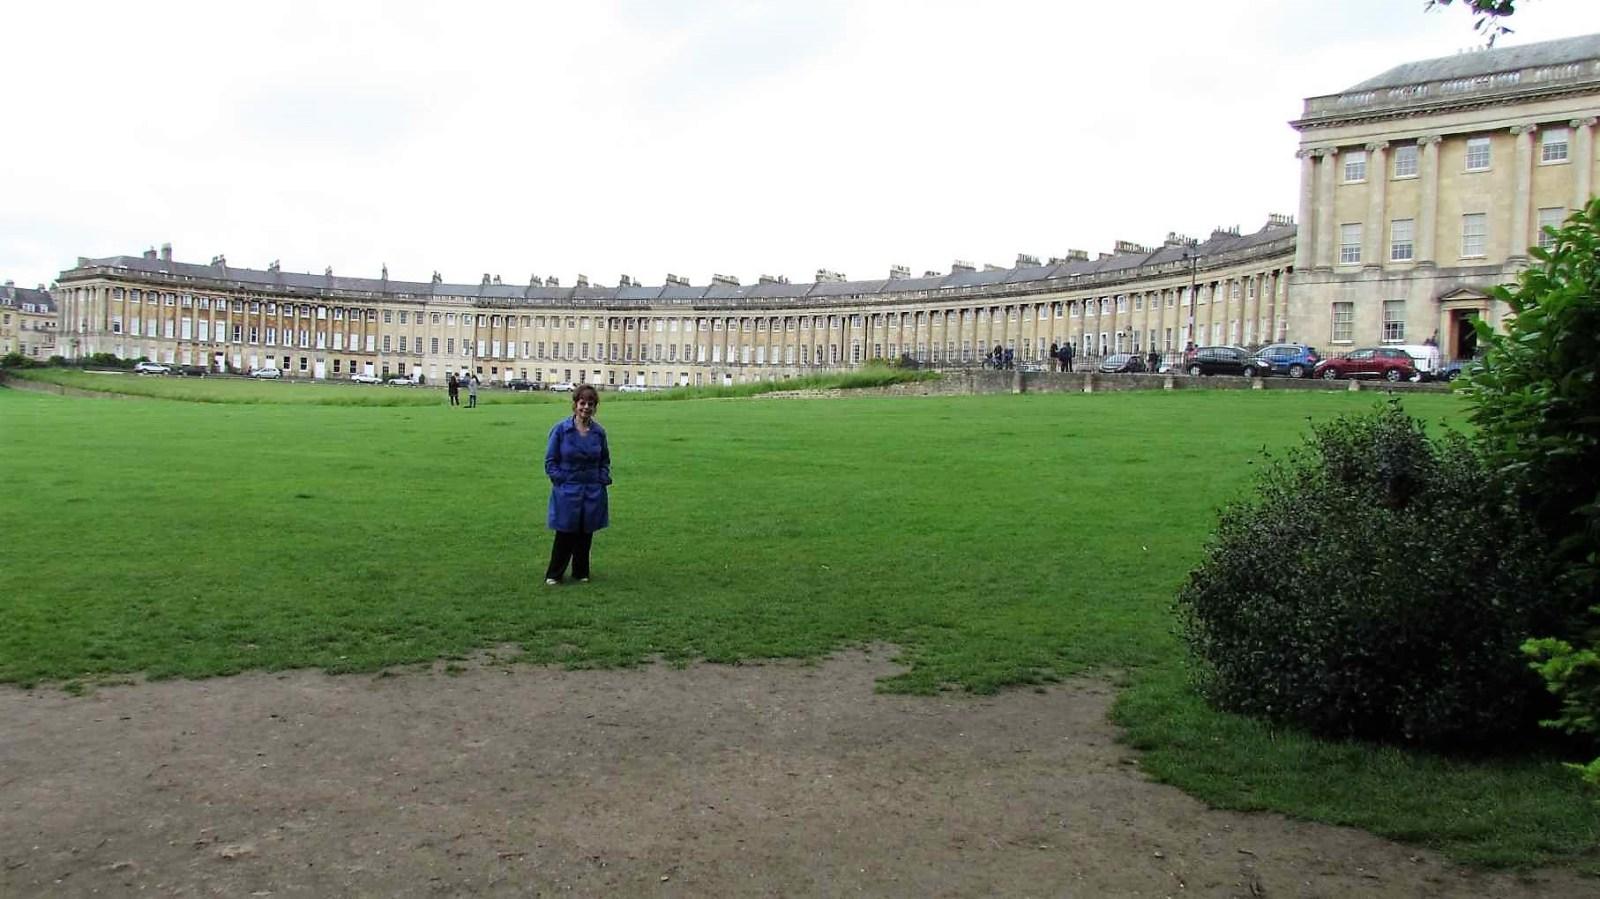 The Royal Crescent: Bath